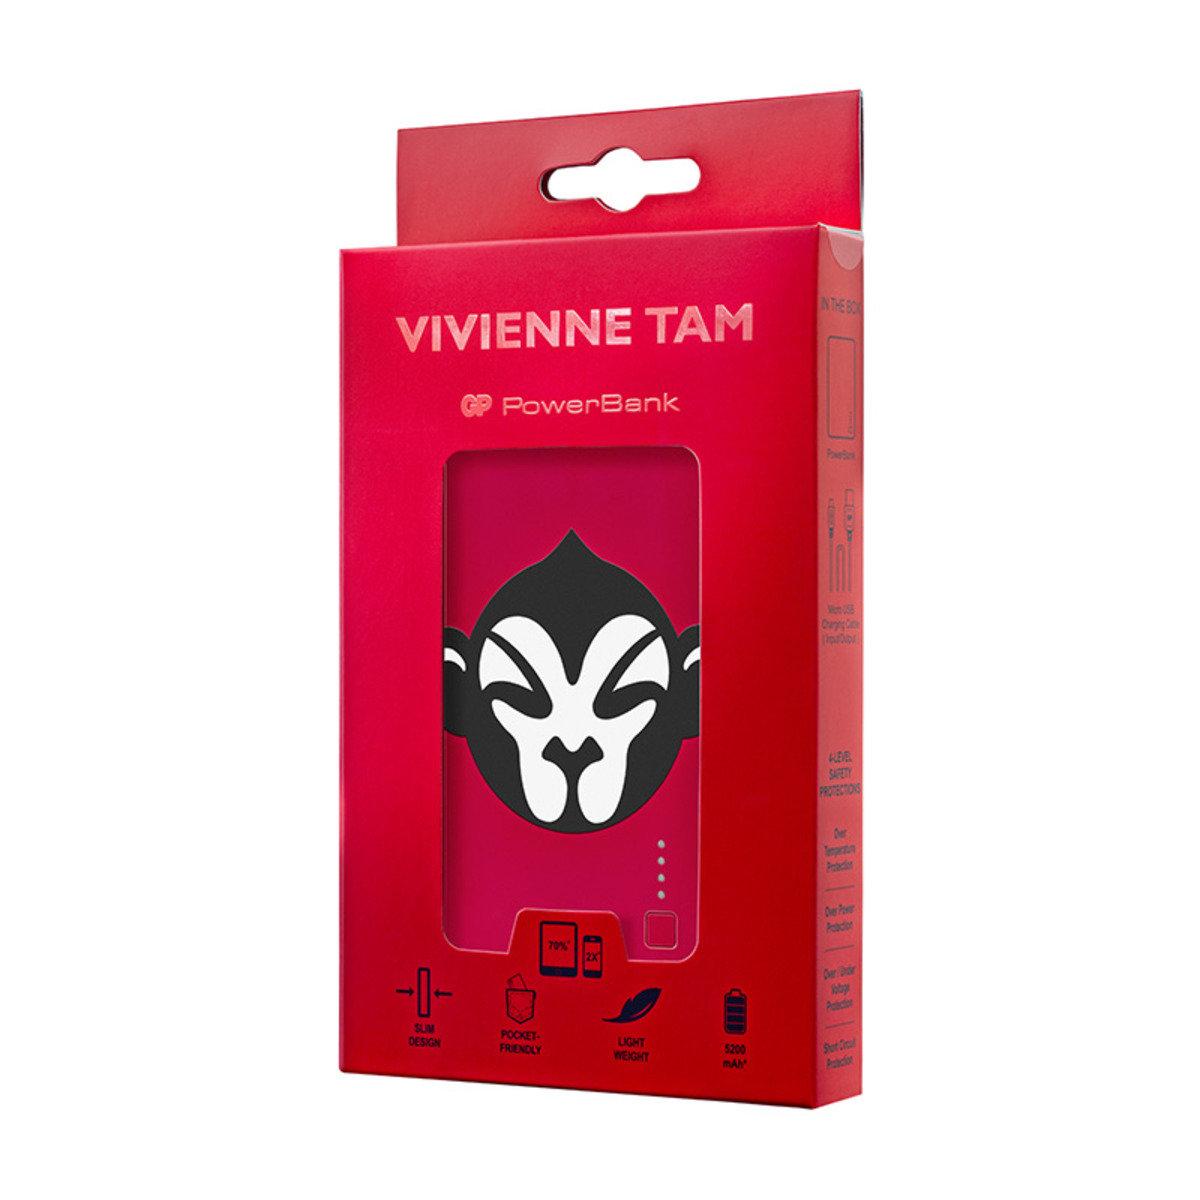 Vivienne Tam x GP 限量版儲電寶 PowerBank 352PB 5200mAh - 小猴王